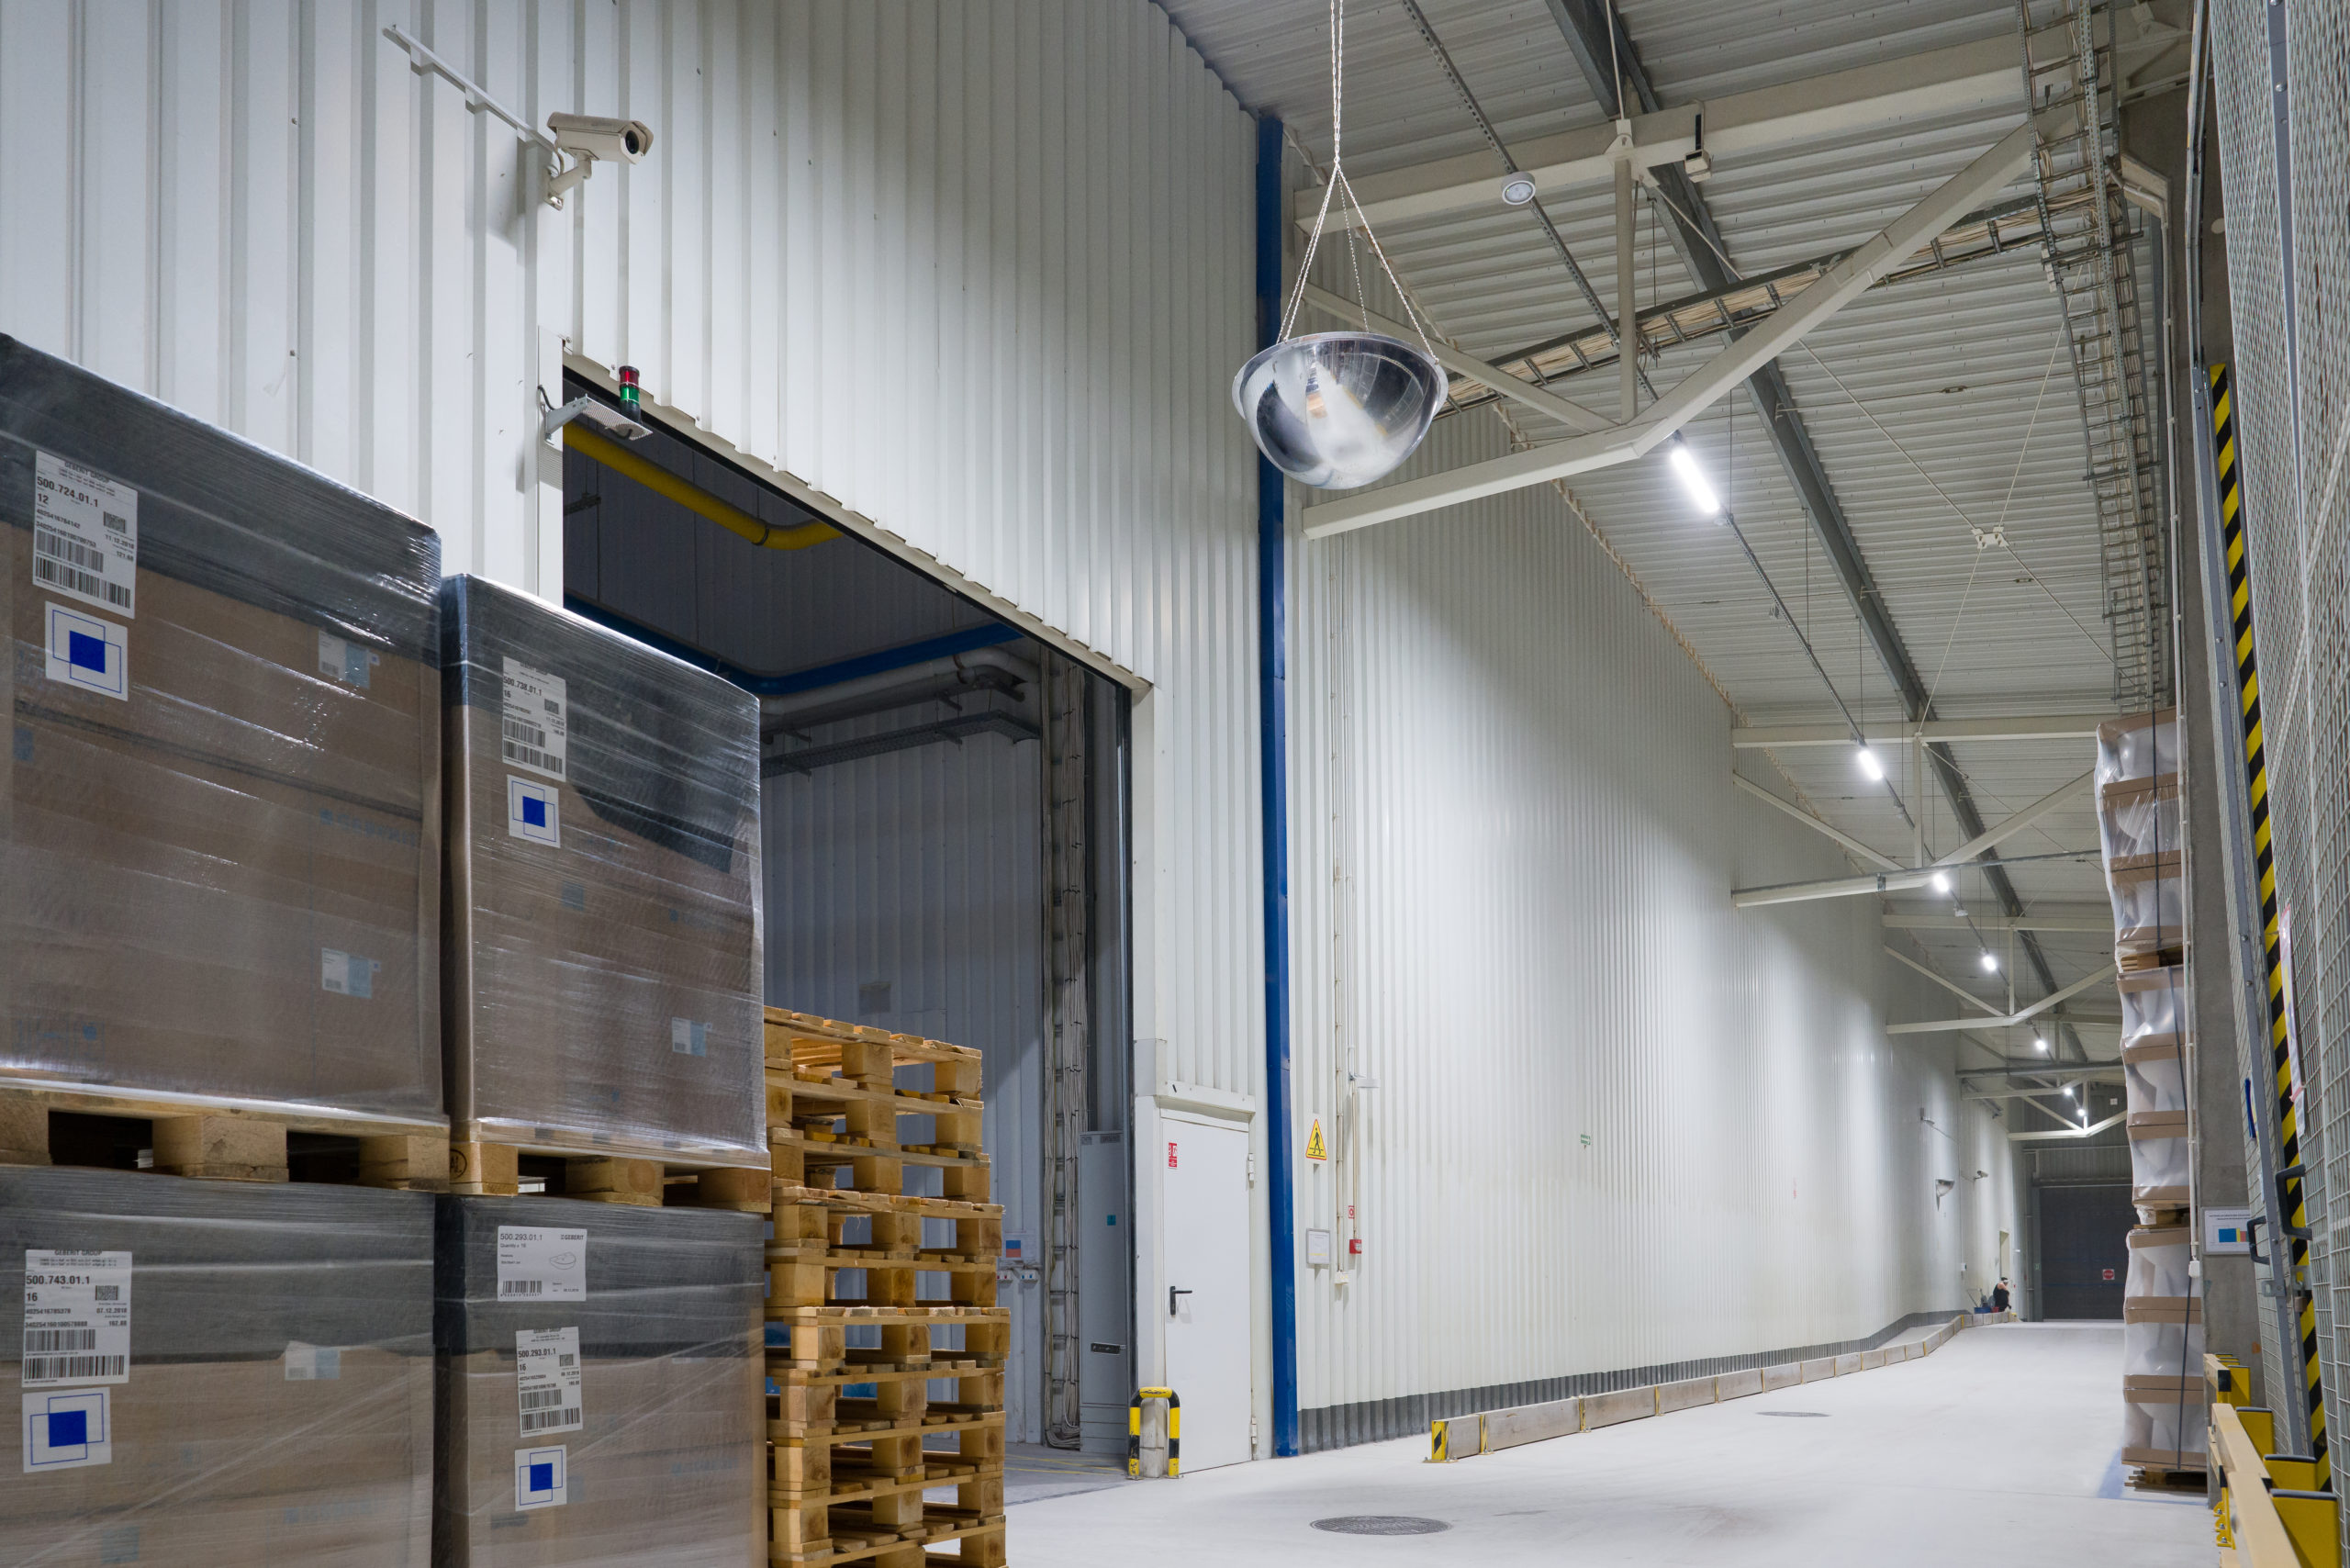 Oprawy Industrial w firmie Geberit w magazynach - Luxon LED